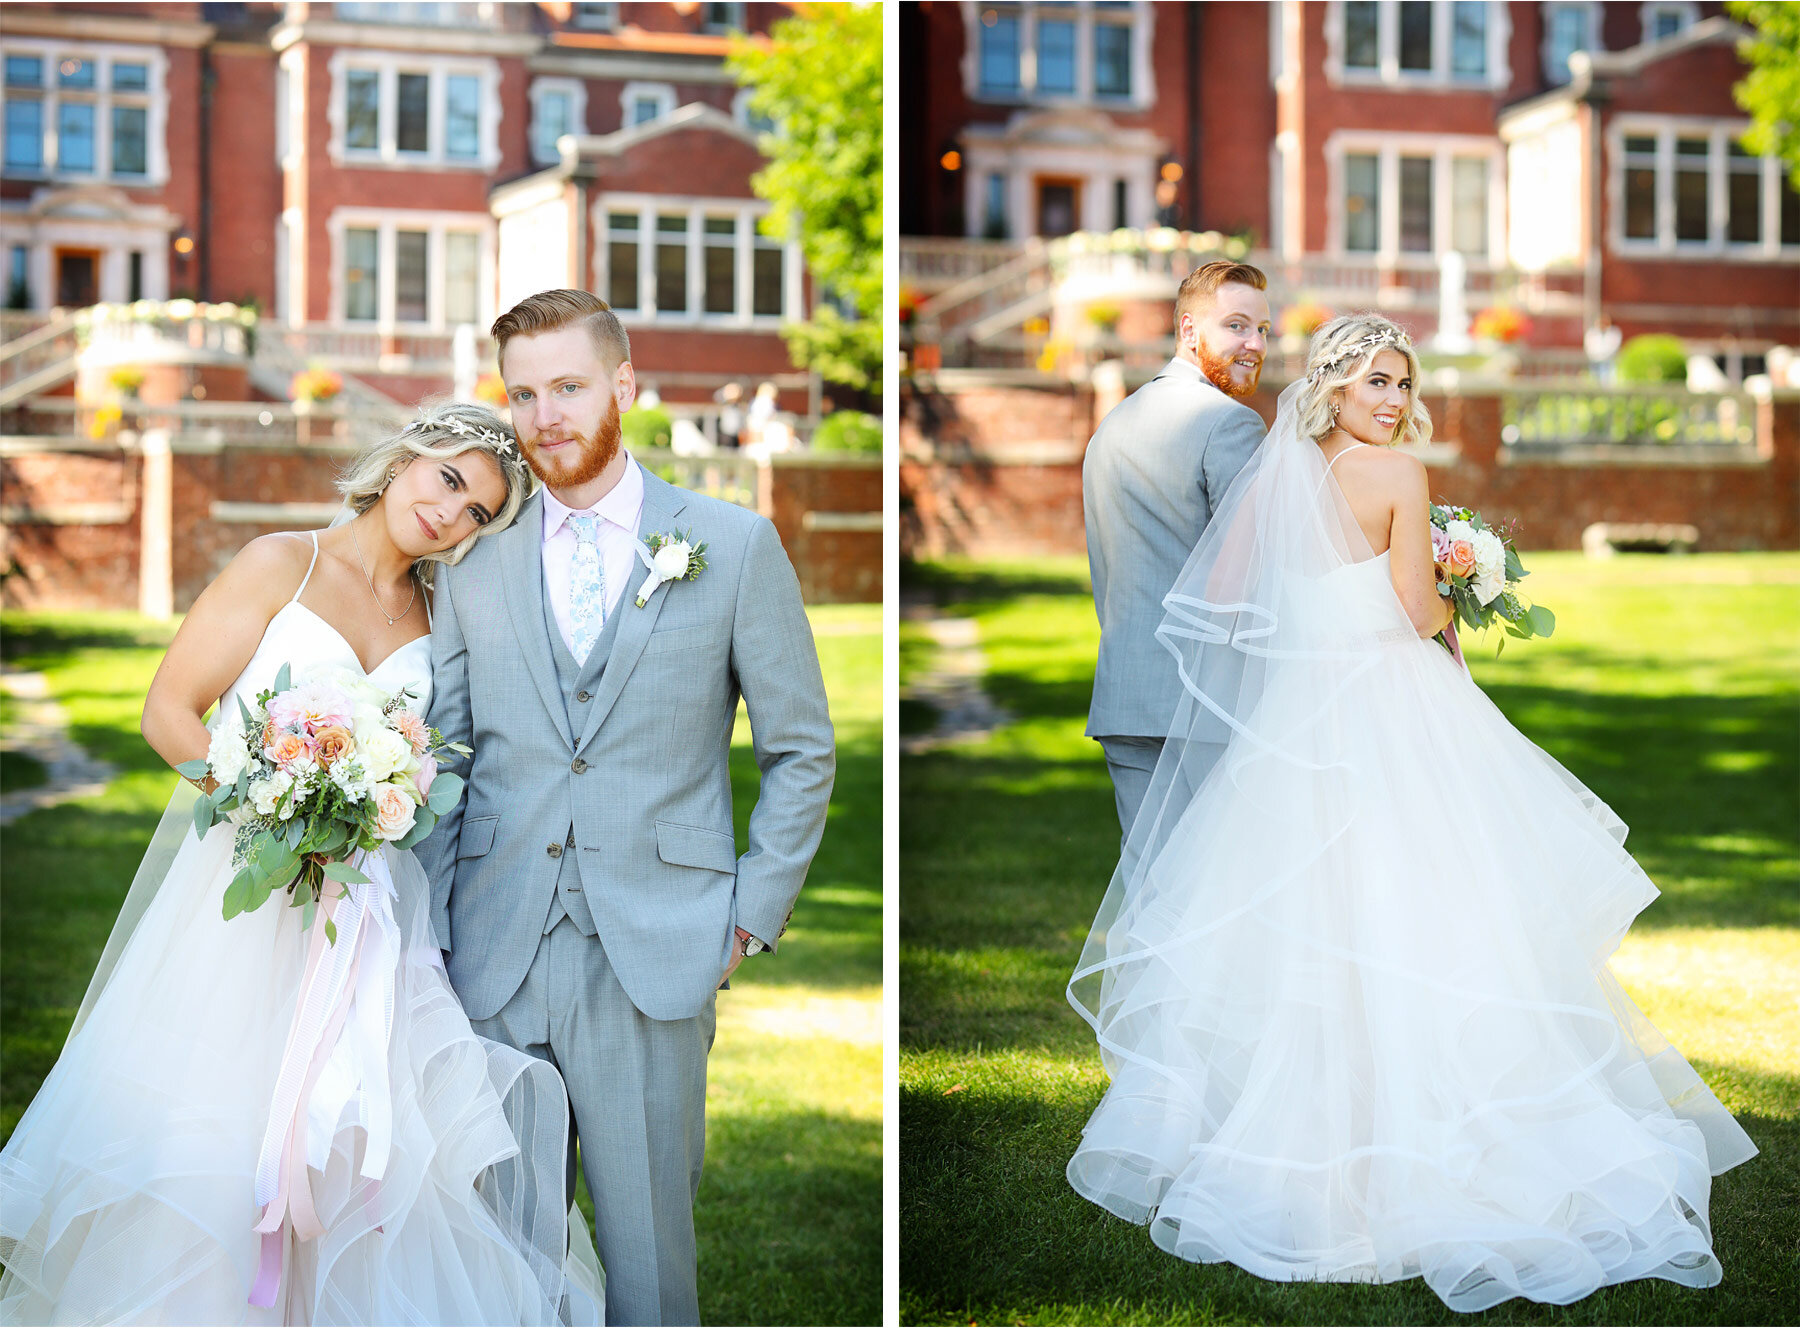 07-Vick-Photography-Wedding-Duluth-Minnesota-Glensheen-Mansion-Groom-Bride-Catherine-and-John.jpg